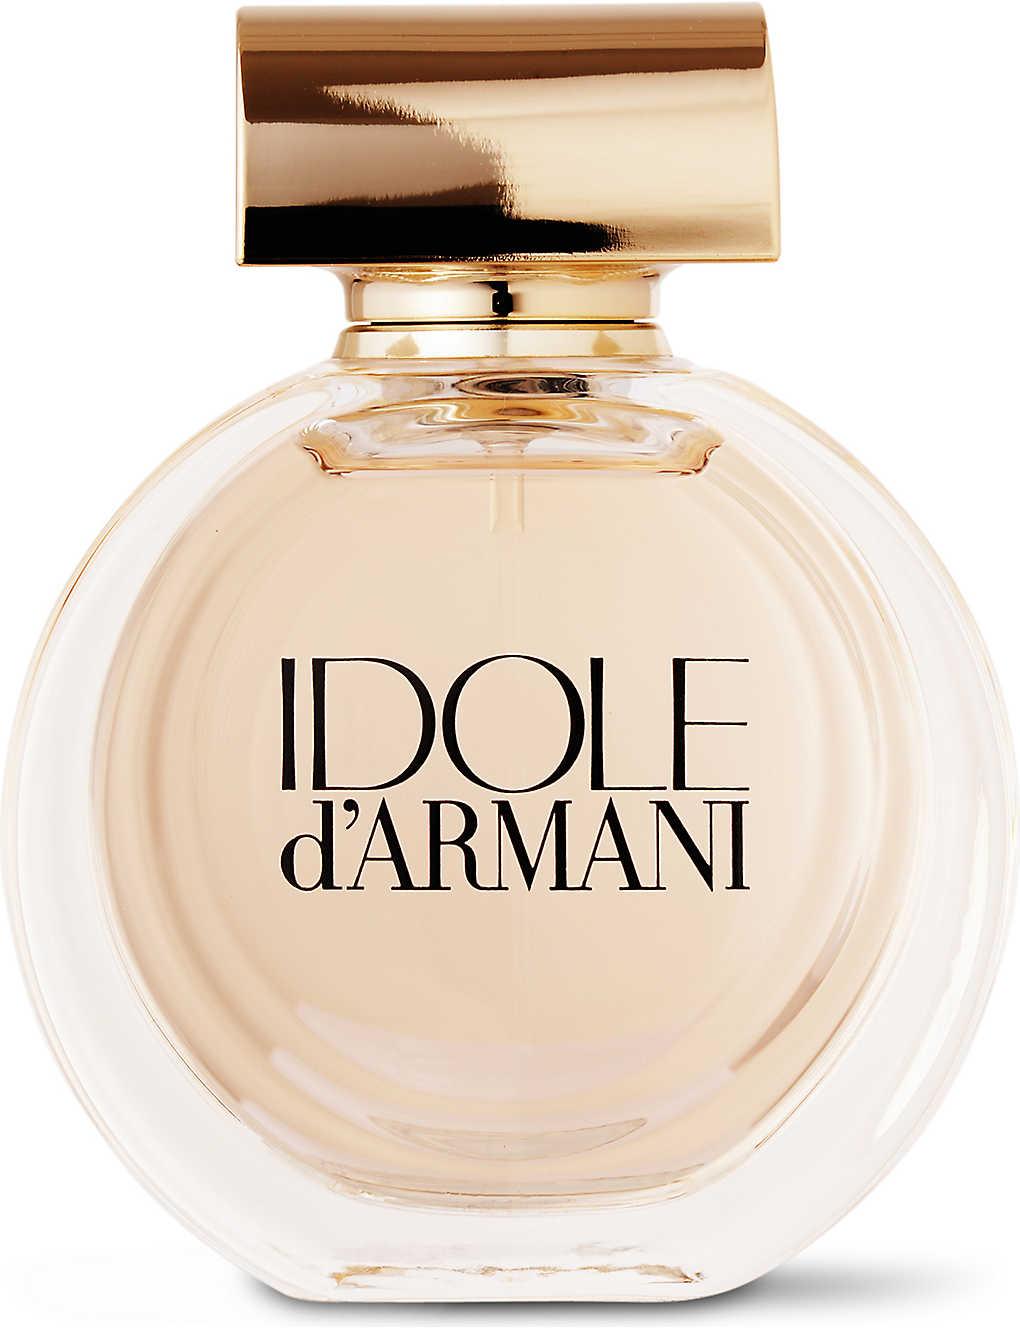 Giorgio Armani Idole Darmani Eau De Parfum 50ml Selfridgescom